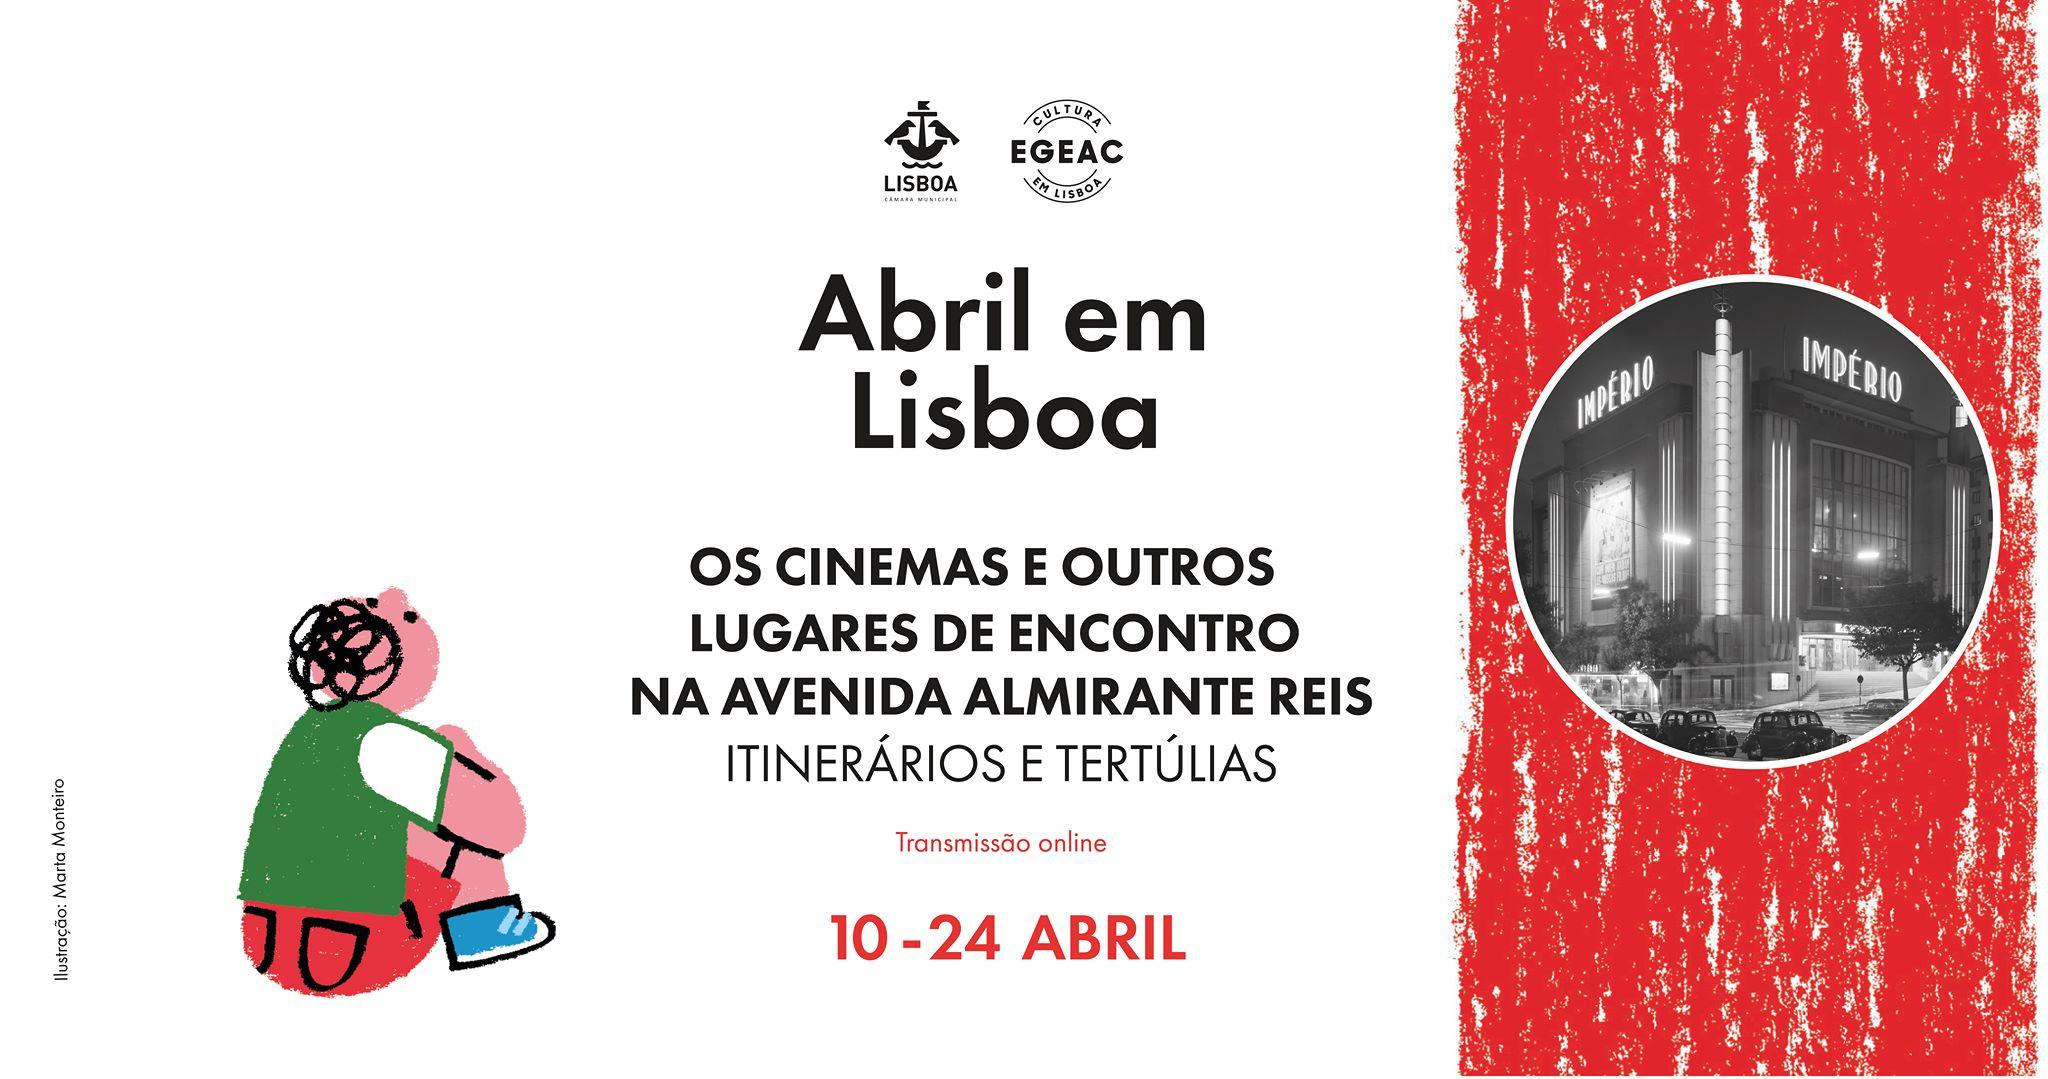 Itinerário e Tertúlias - Os cinemas e outros lugares de encontro na Avenida Almirante Reis